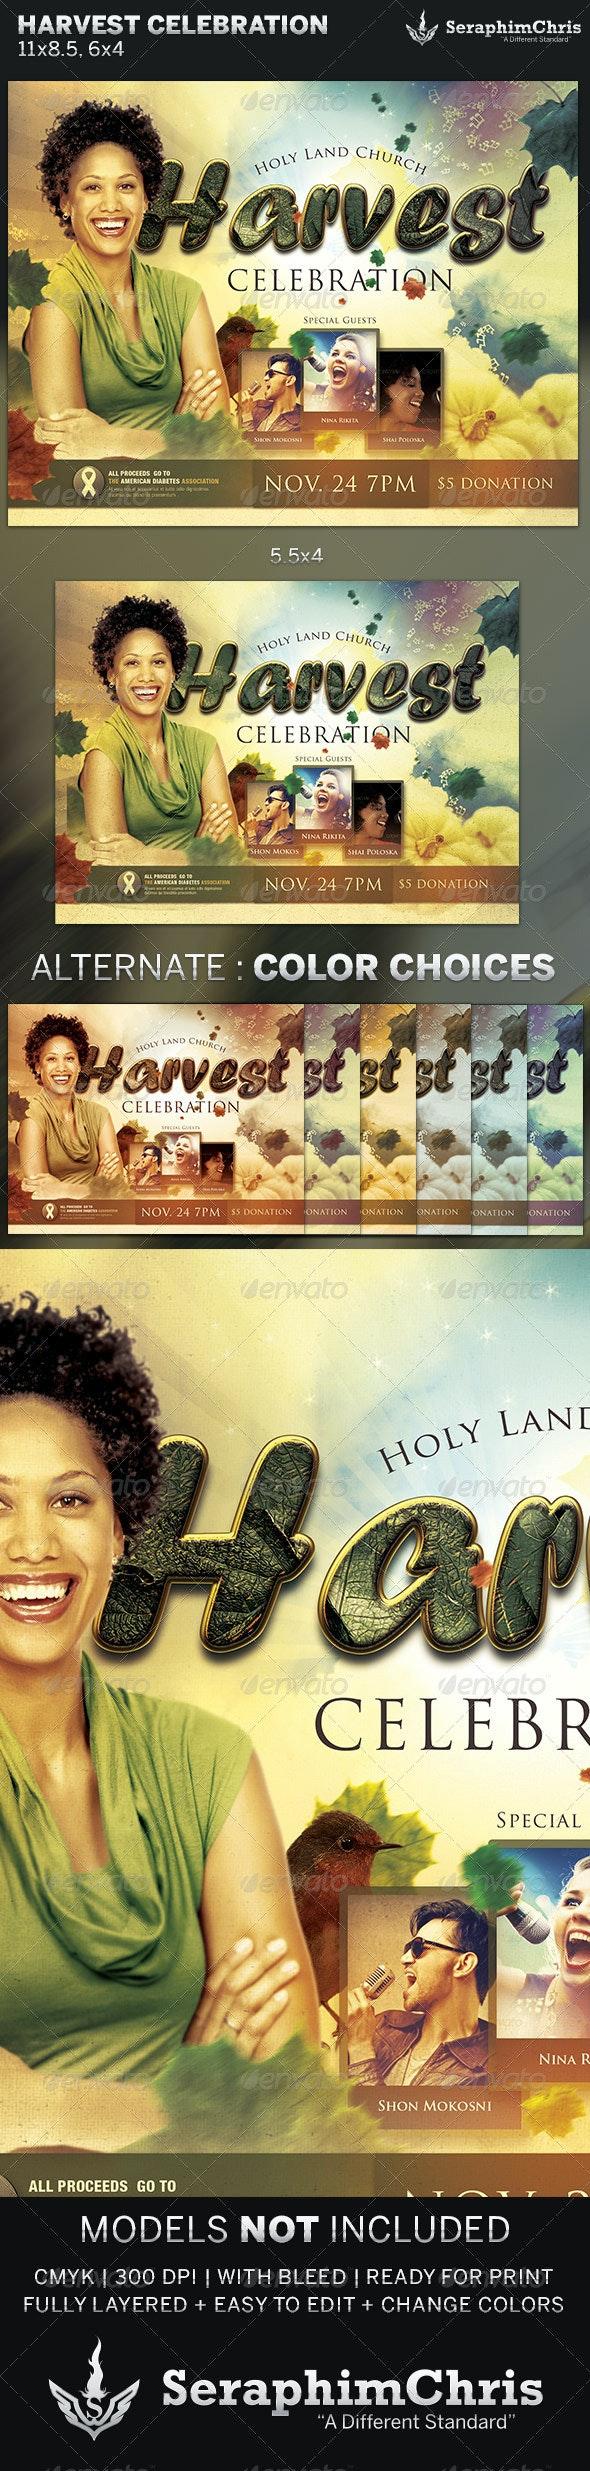 Harvest Celebration: Church Flyer Template - Church Flyers